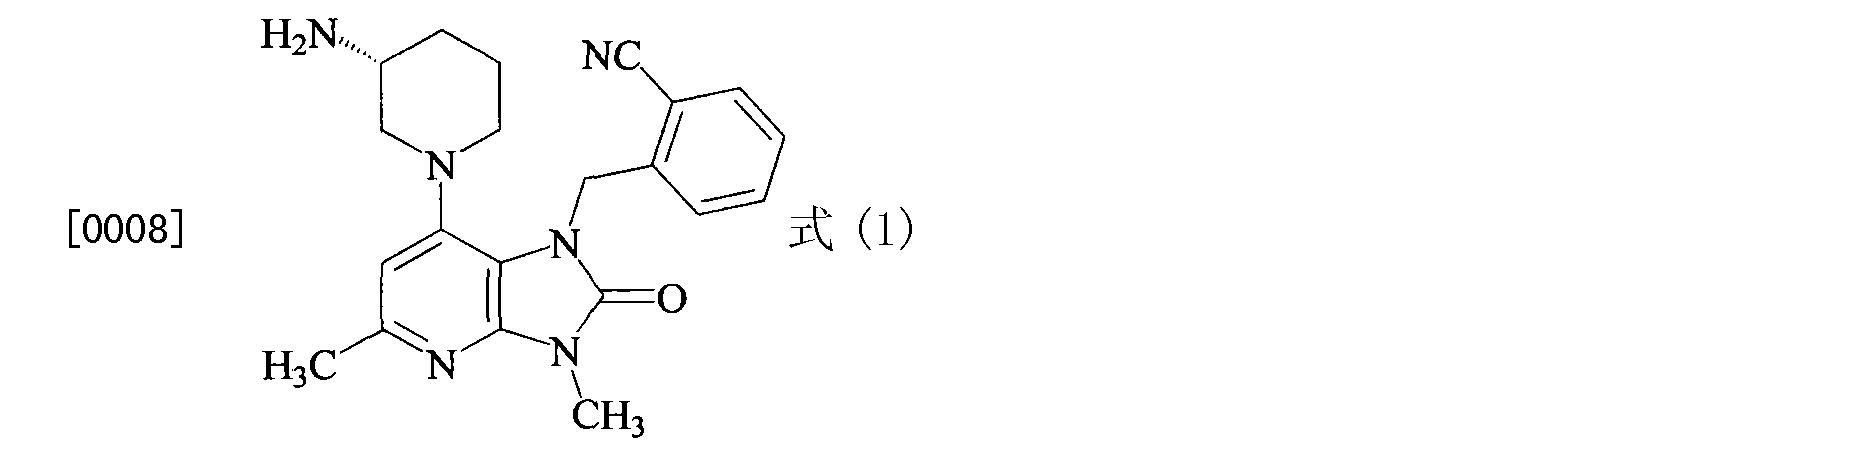 Figure CN102863440AD00032